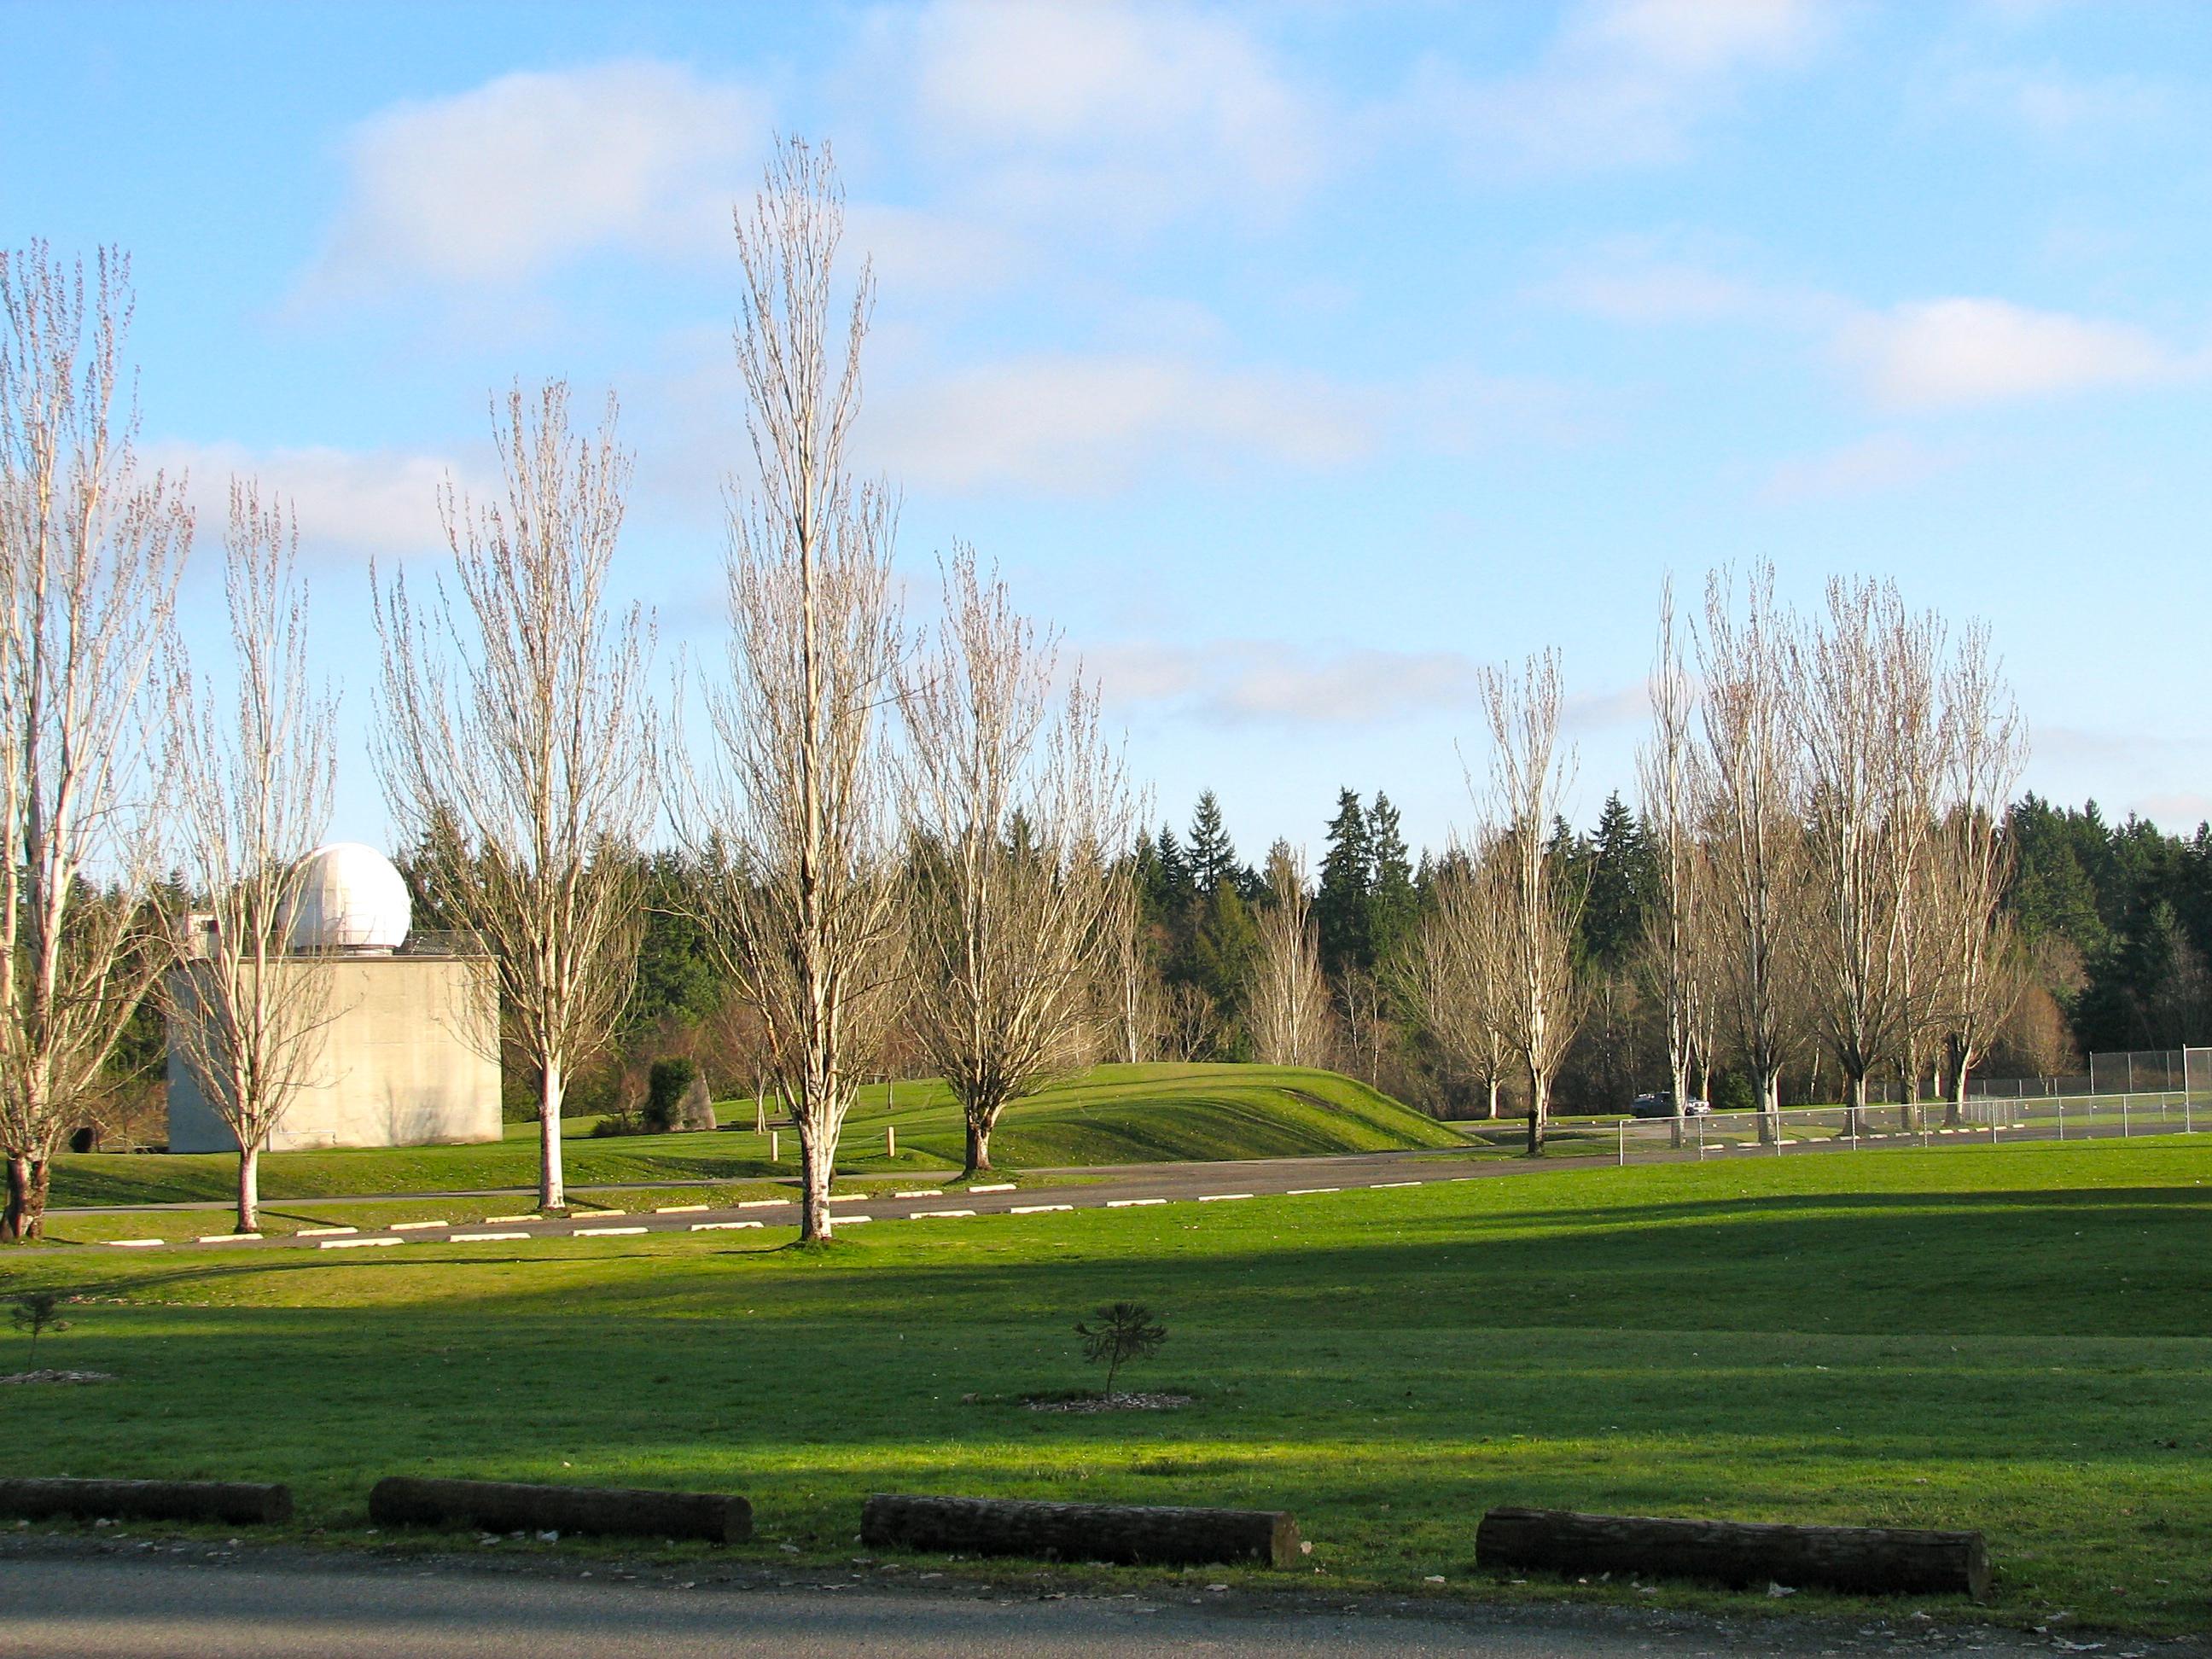 The Ritchie Observatory at Battle Point Park on Bainbridge Island.